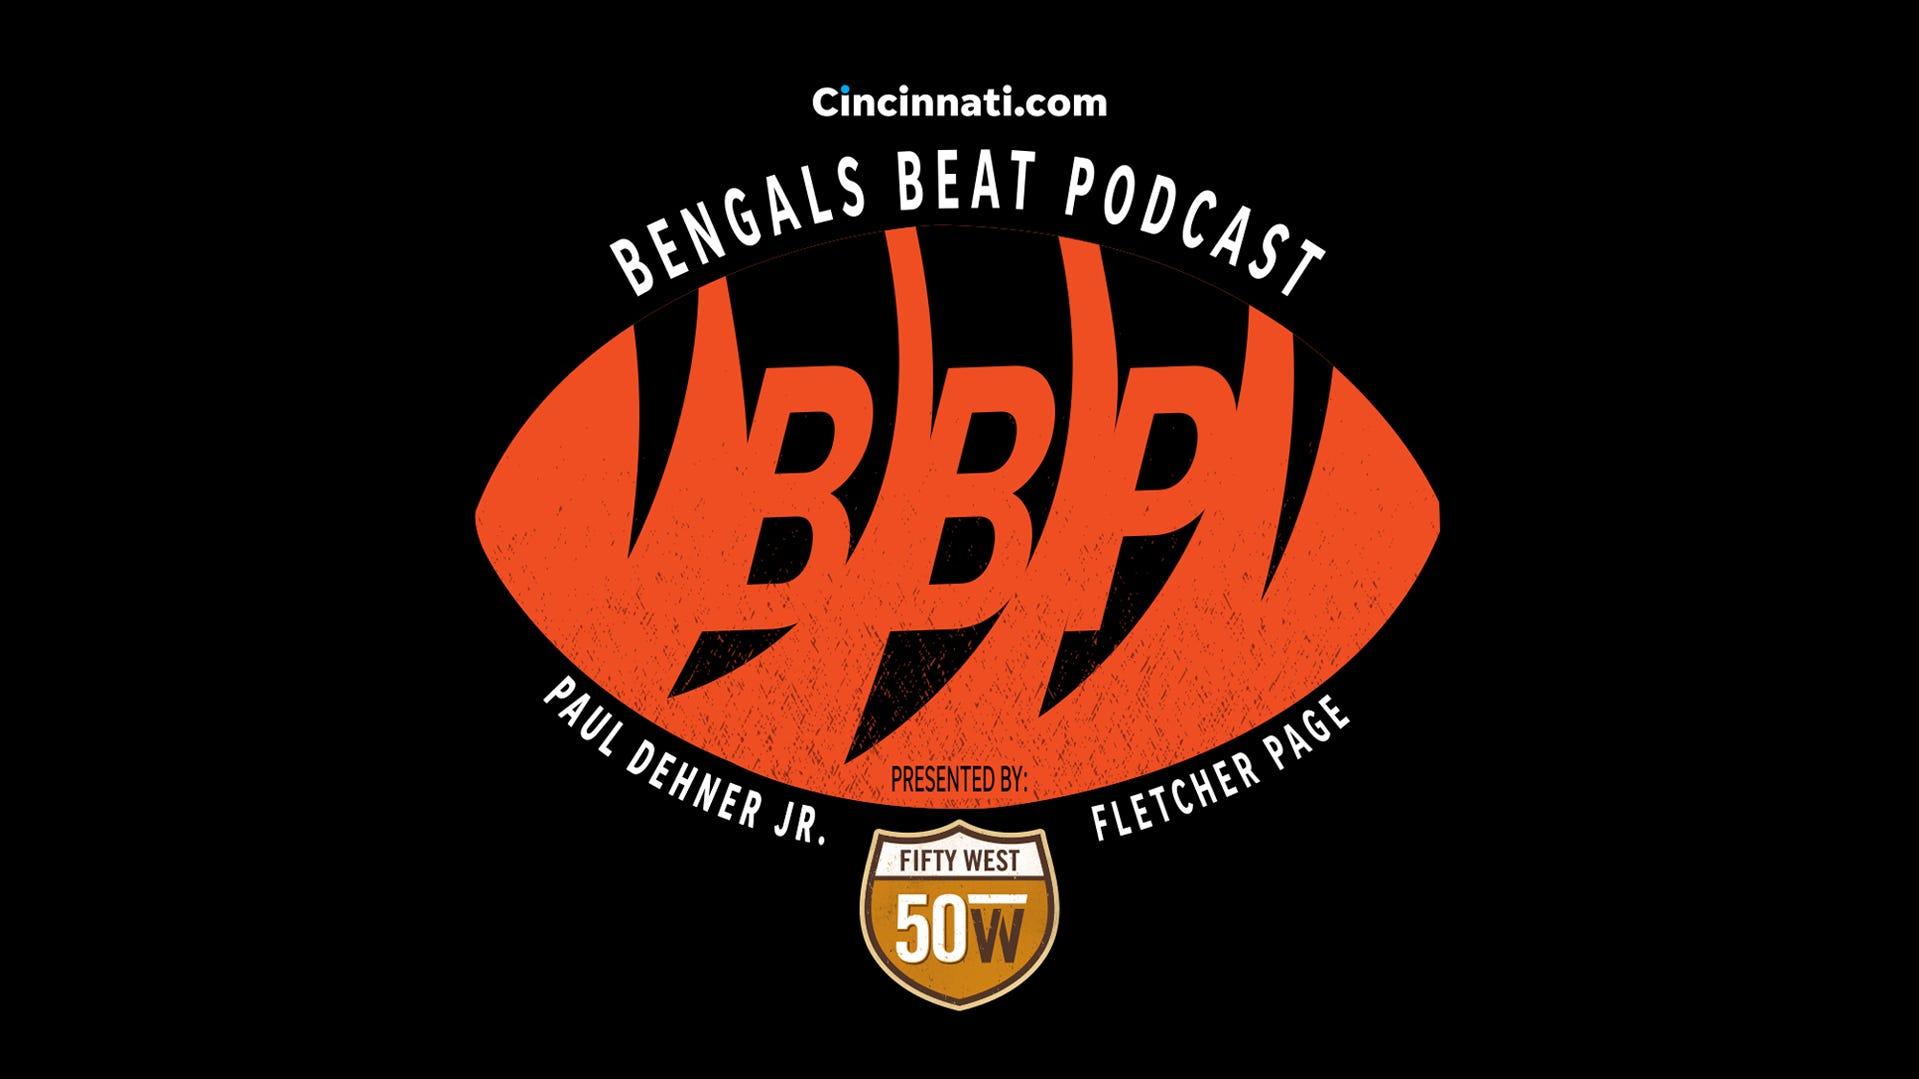 Cincinnati Bengals Beat Podcast: The official 2019 NFL Draft primer